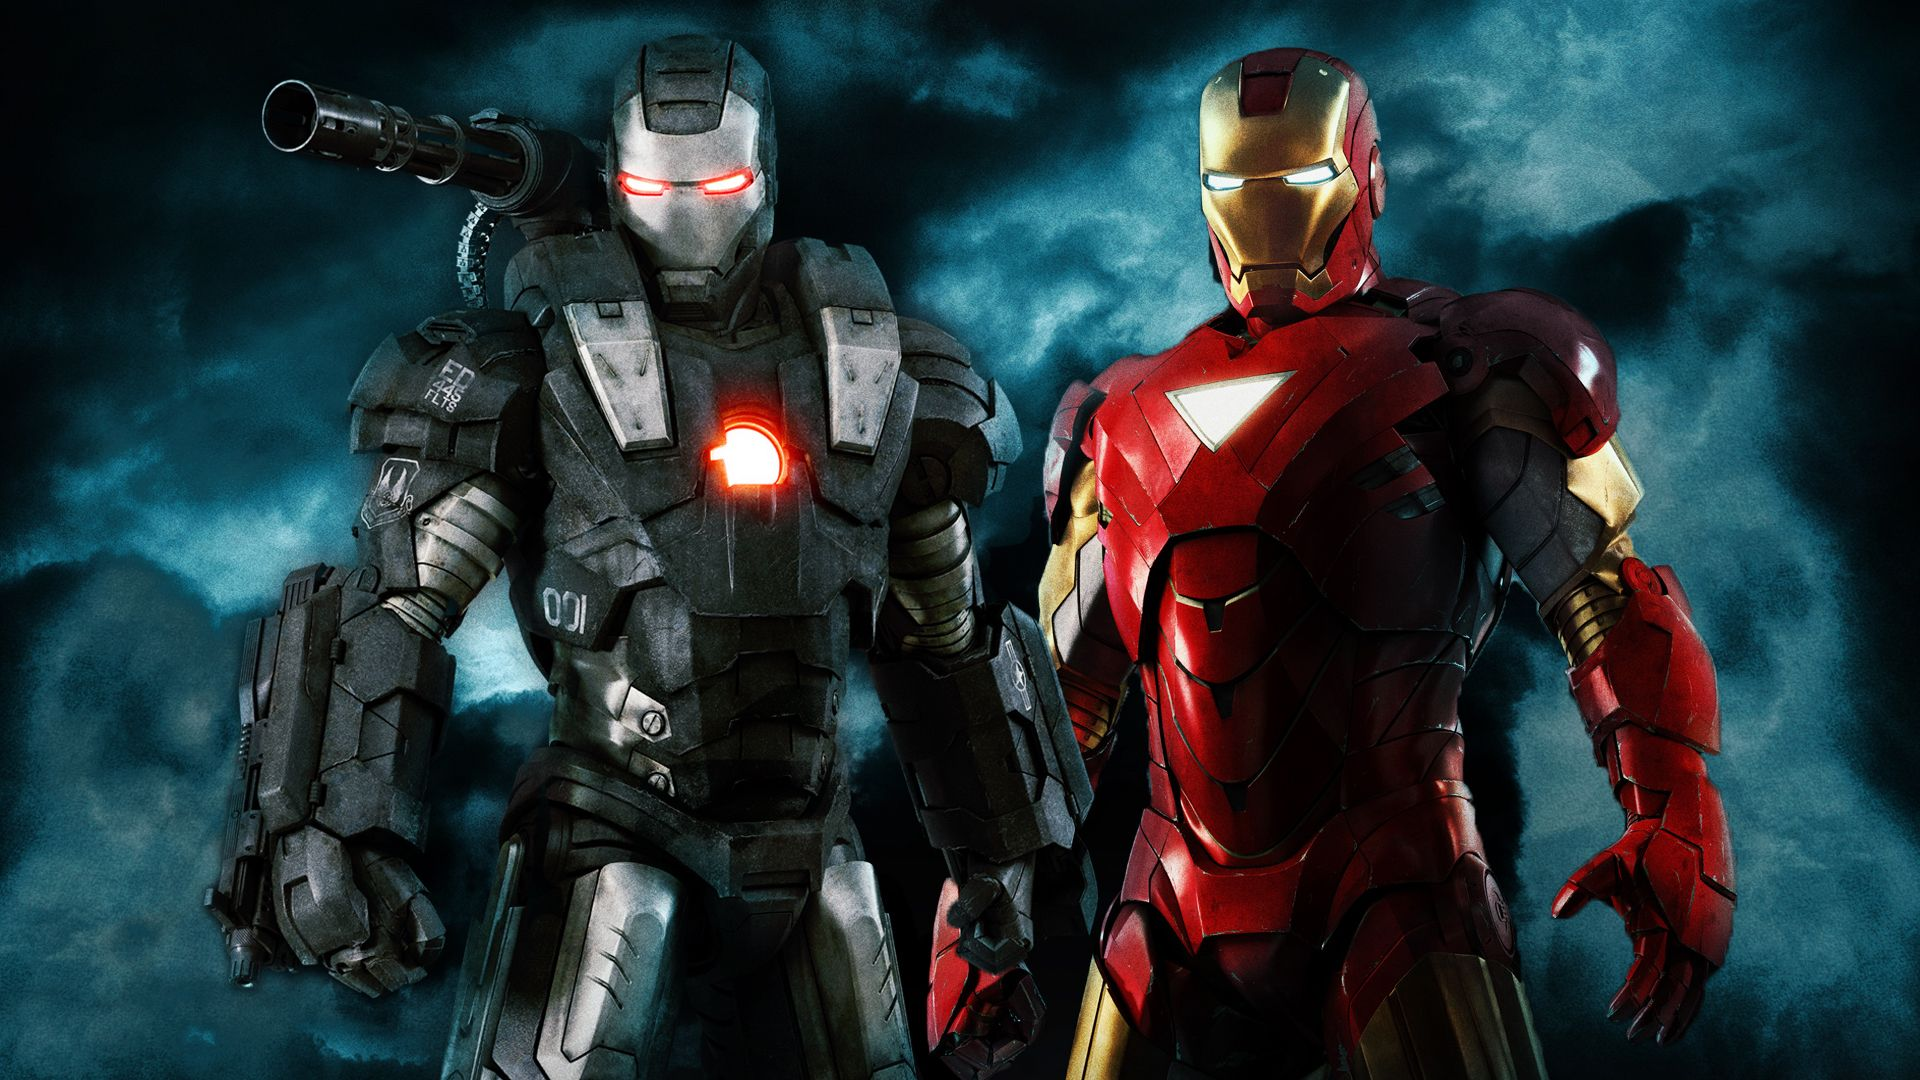 Iron Man 2 wallpaper | Fondo de pantalla de iron man, Cómics, Fotos de marvel